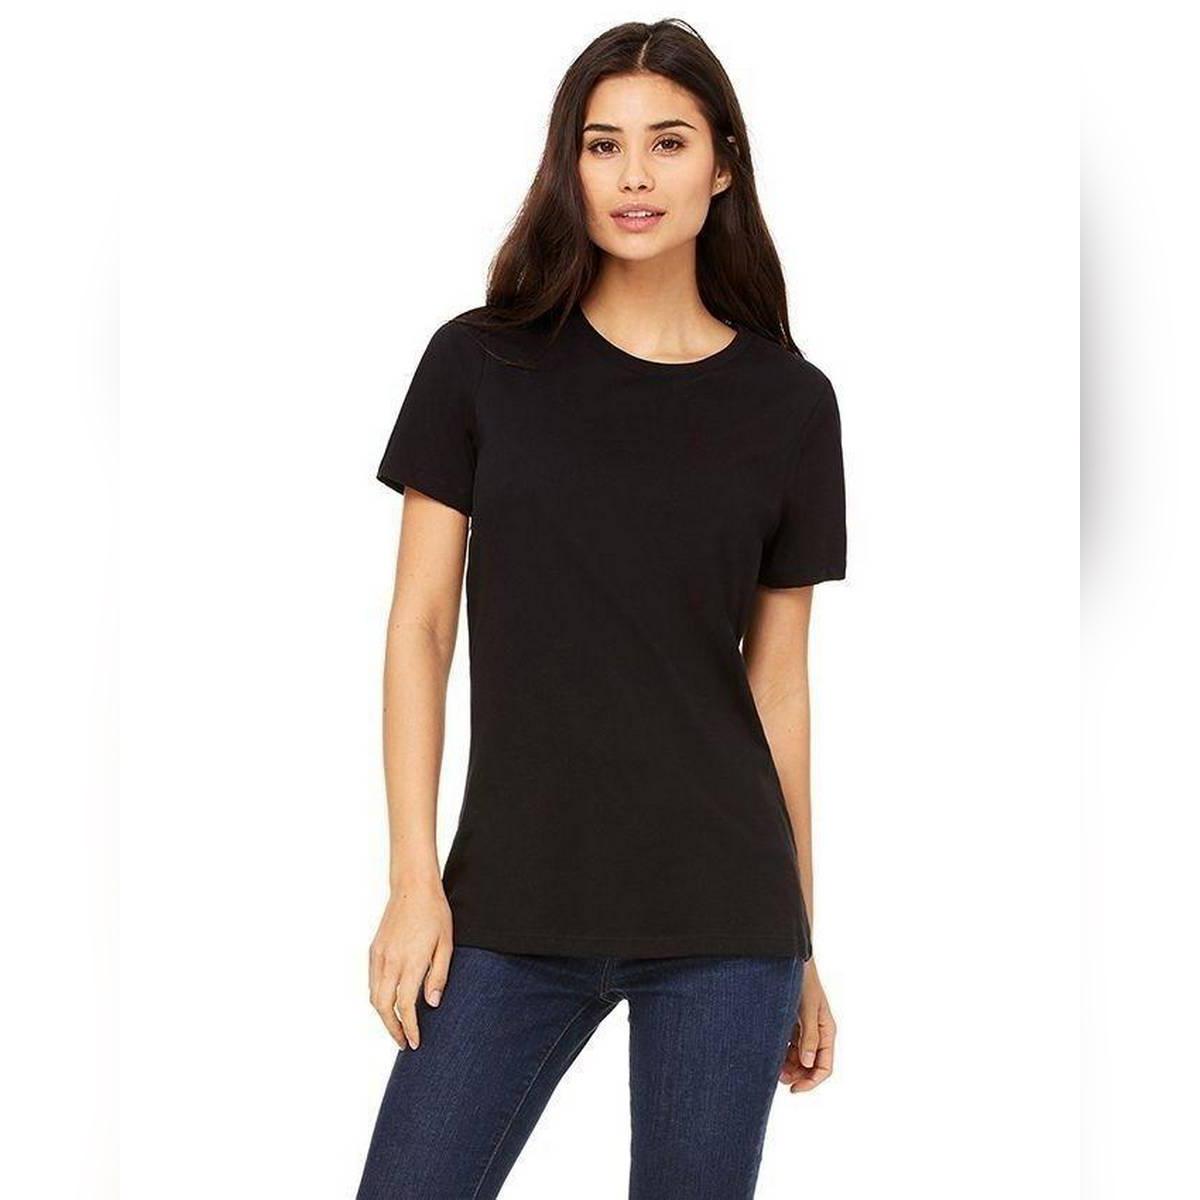 Plain Cotton TShirt For Women - Black